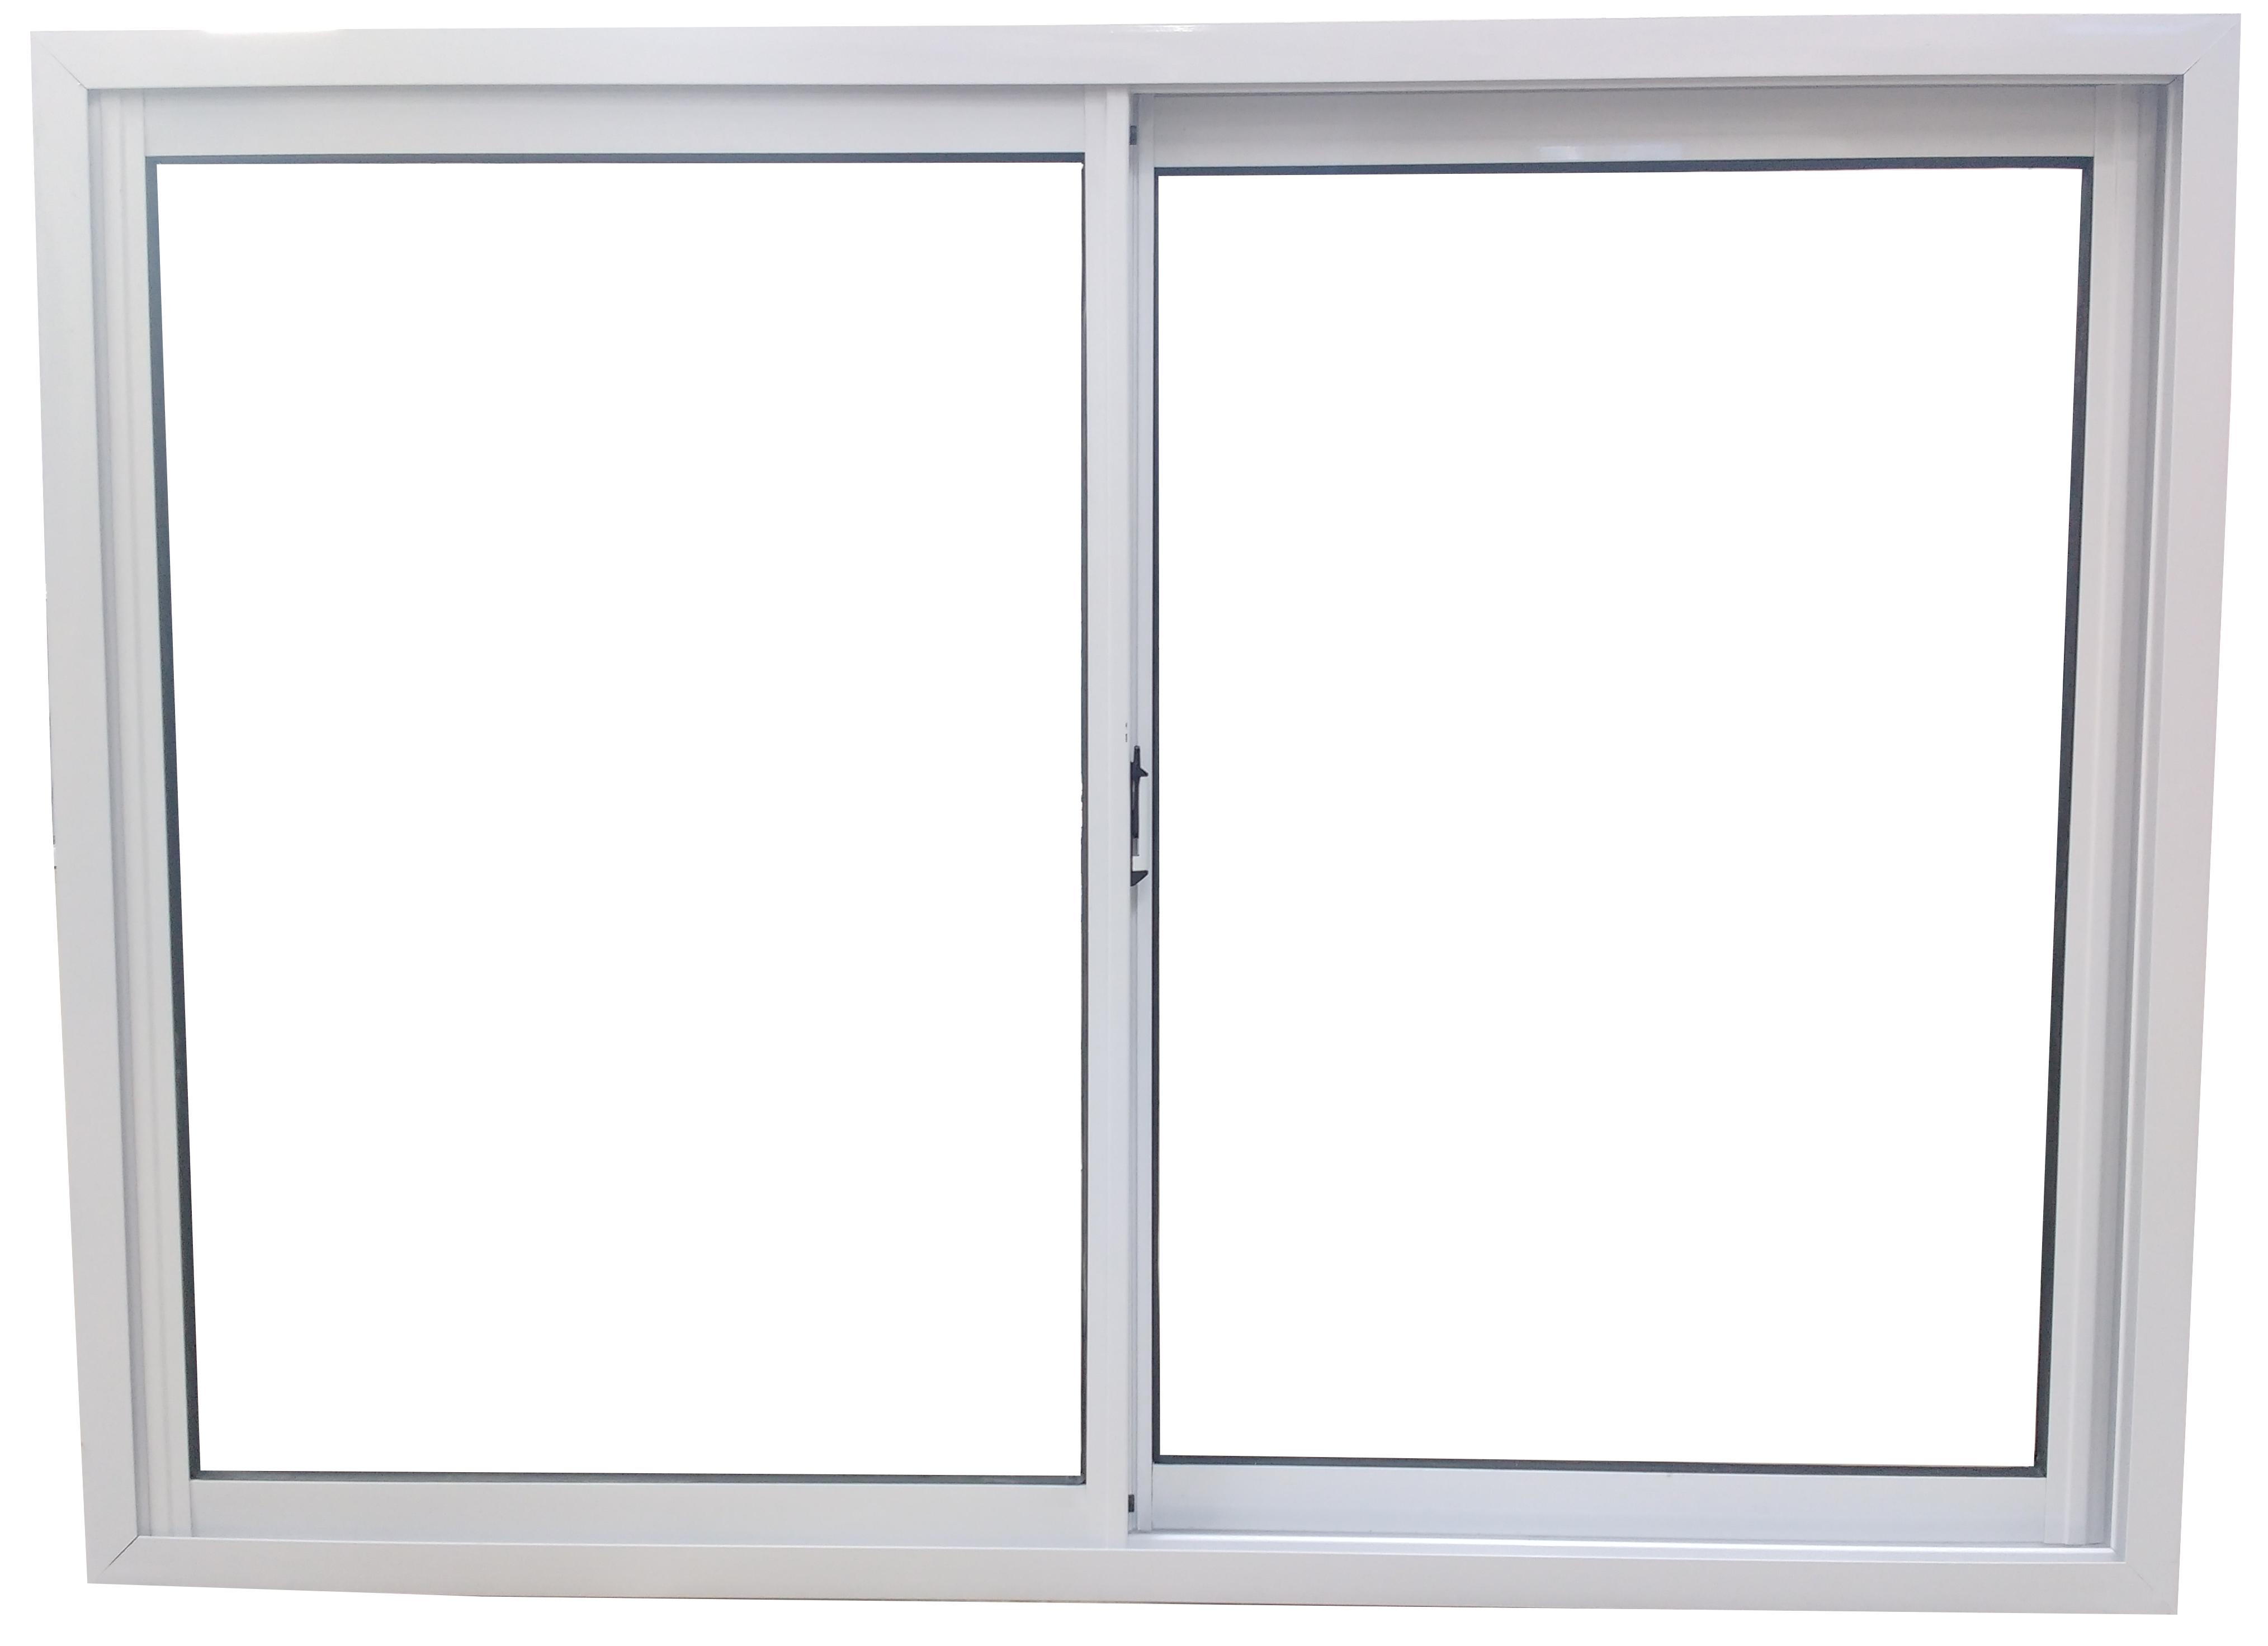 Ventanas herrero blanco 4mm vidrio entero ventana for Window design png